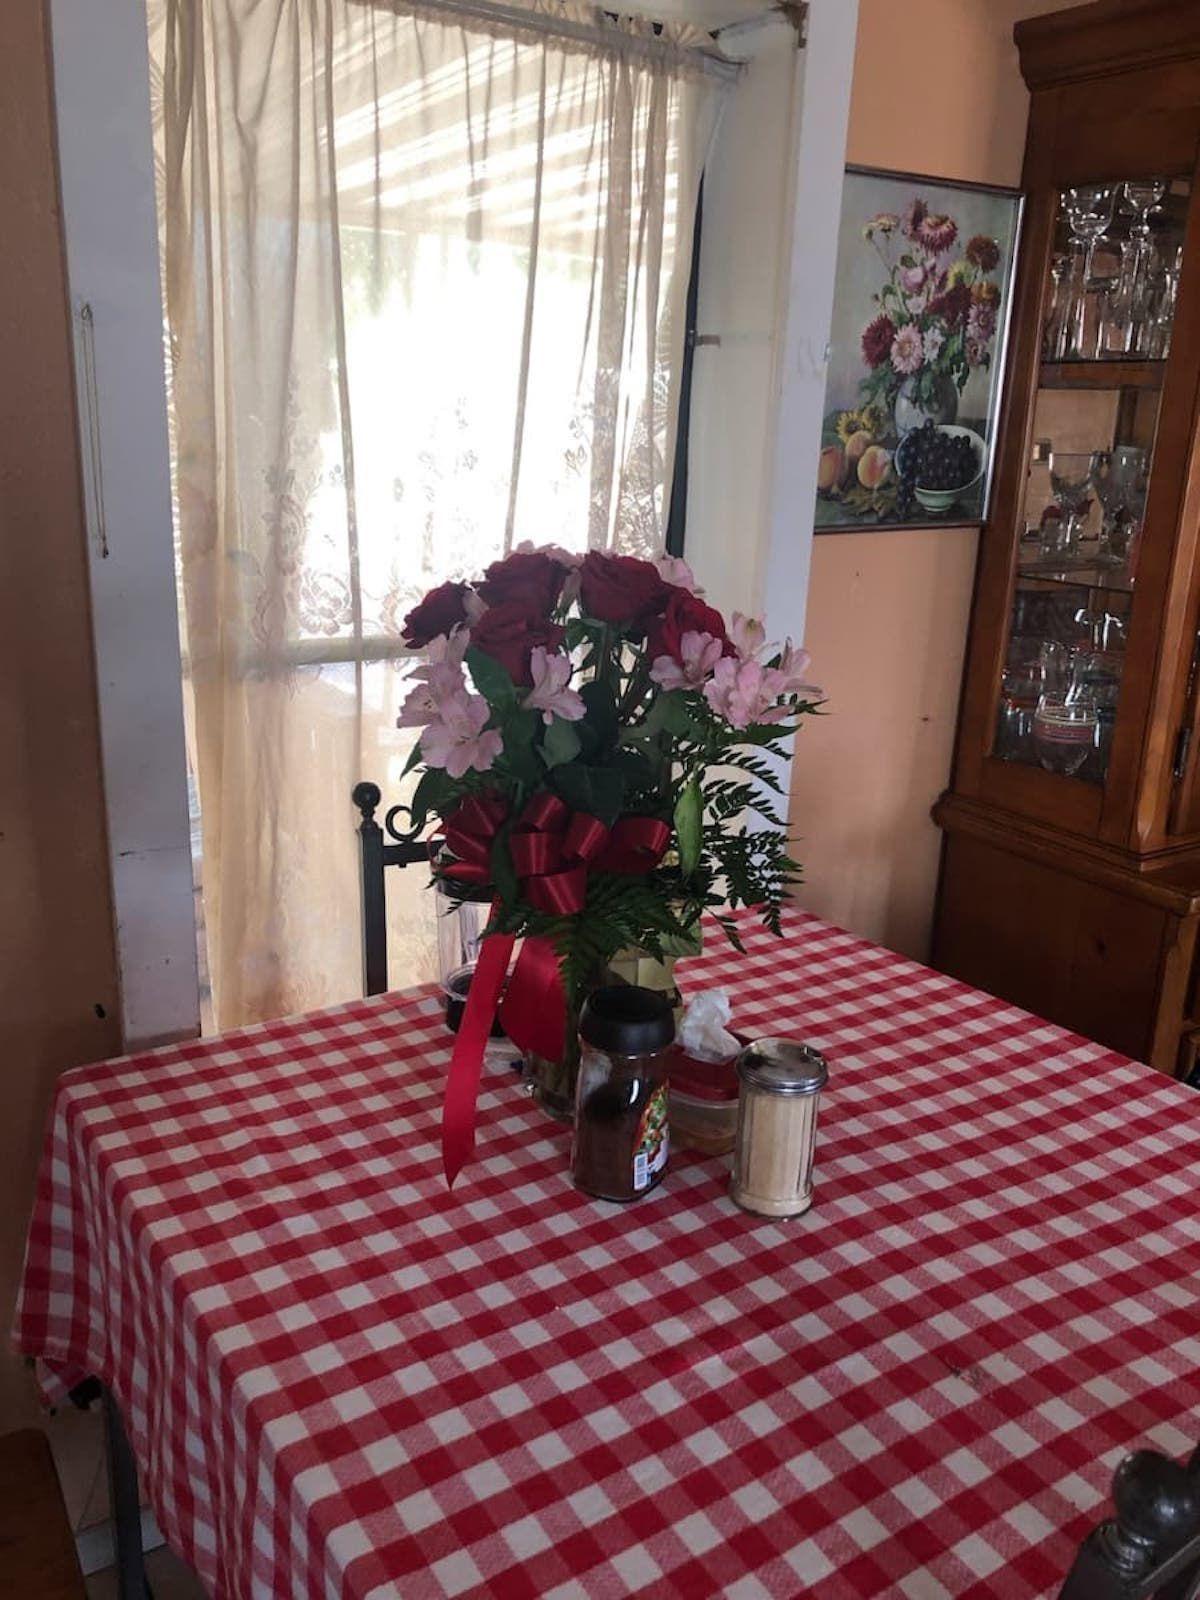 Roses in Irene's home